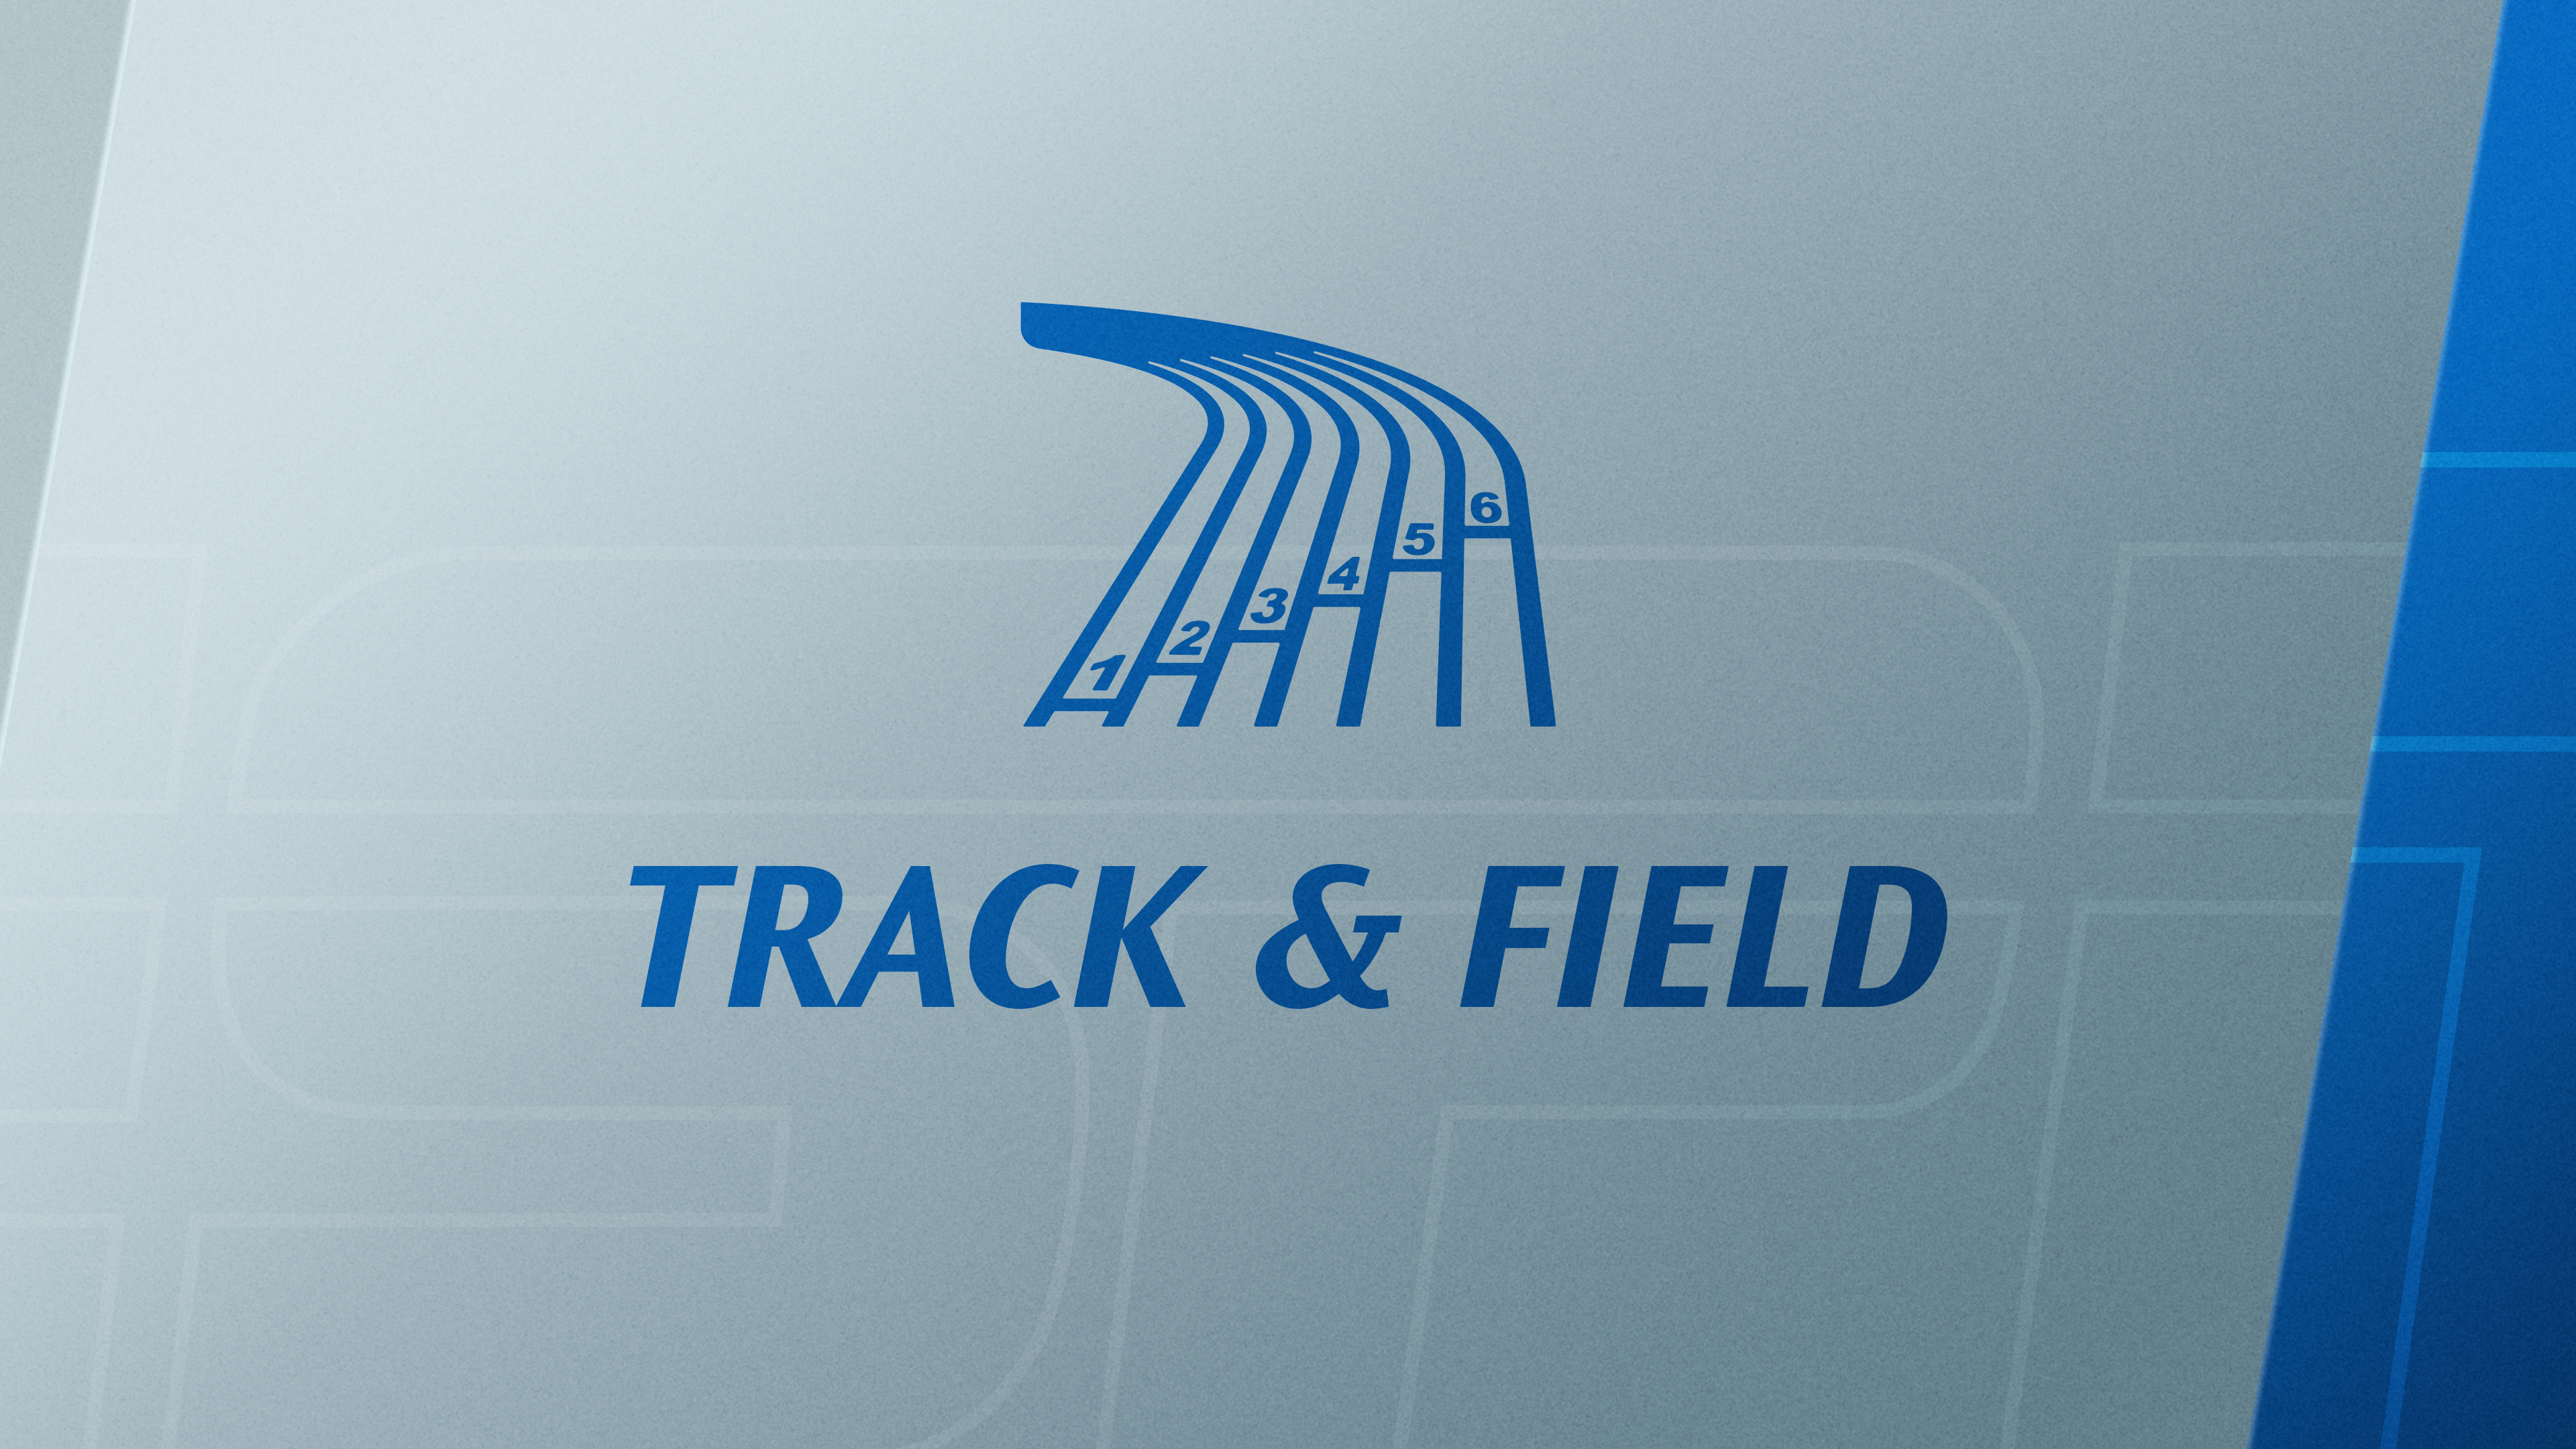 SEC Indoor Track & Field Championships